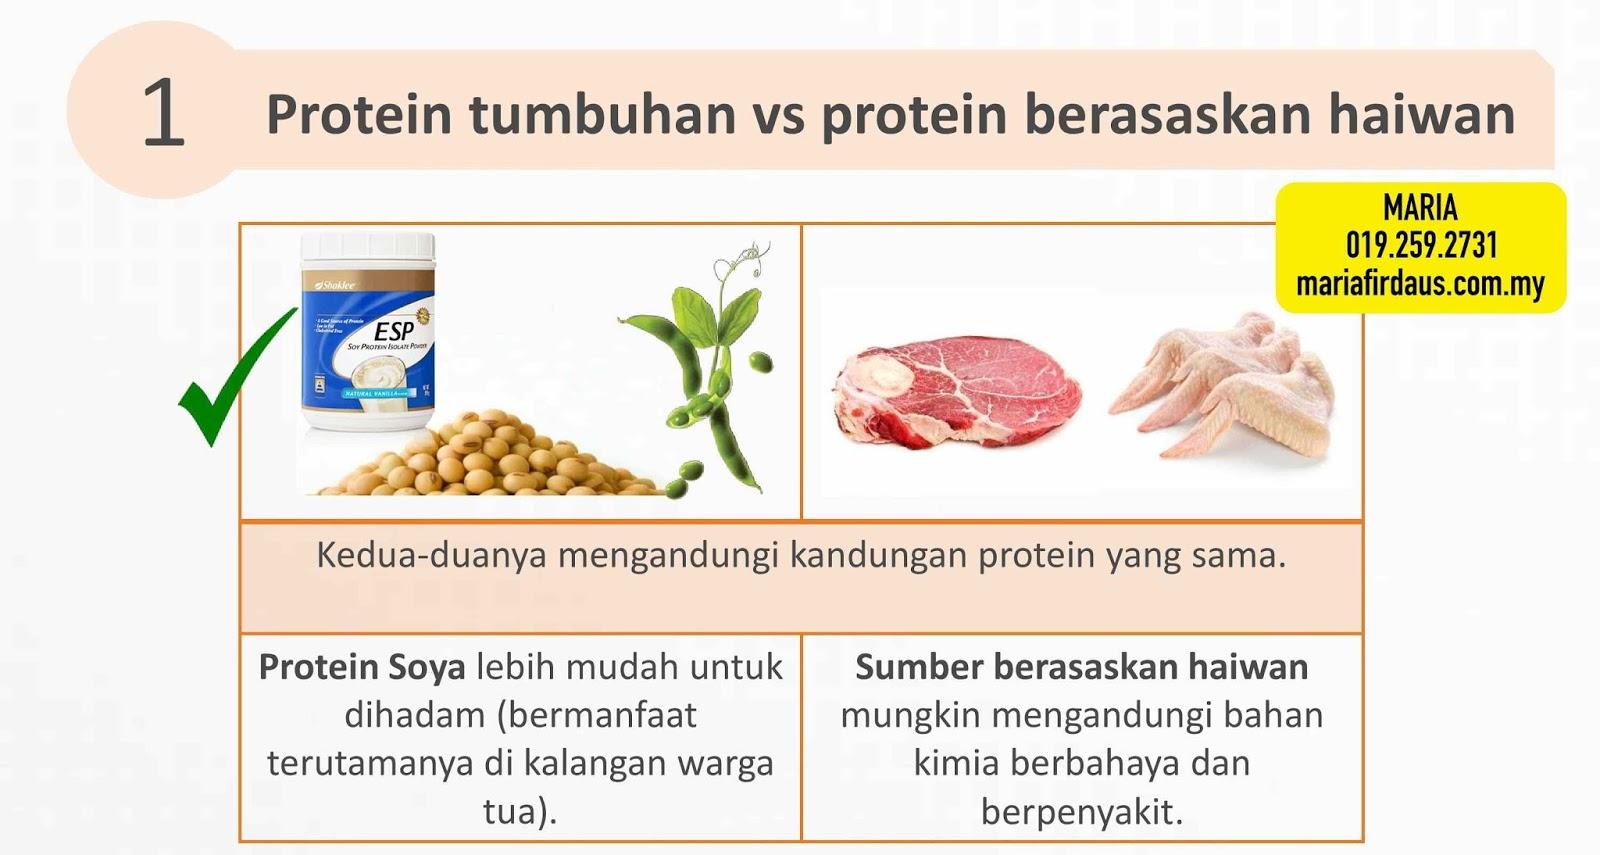 Vitamin Shaklee sumber nutrisi terbaik buat kanak-kanak